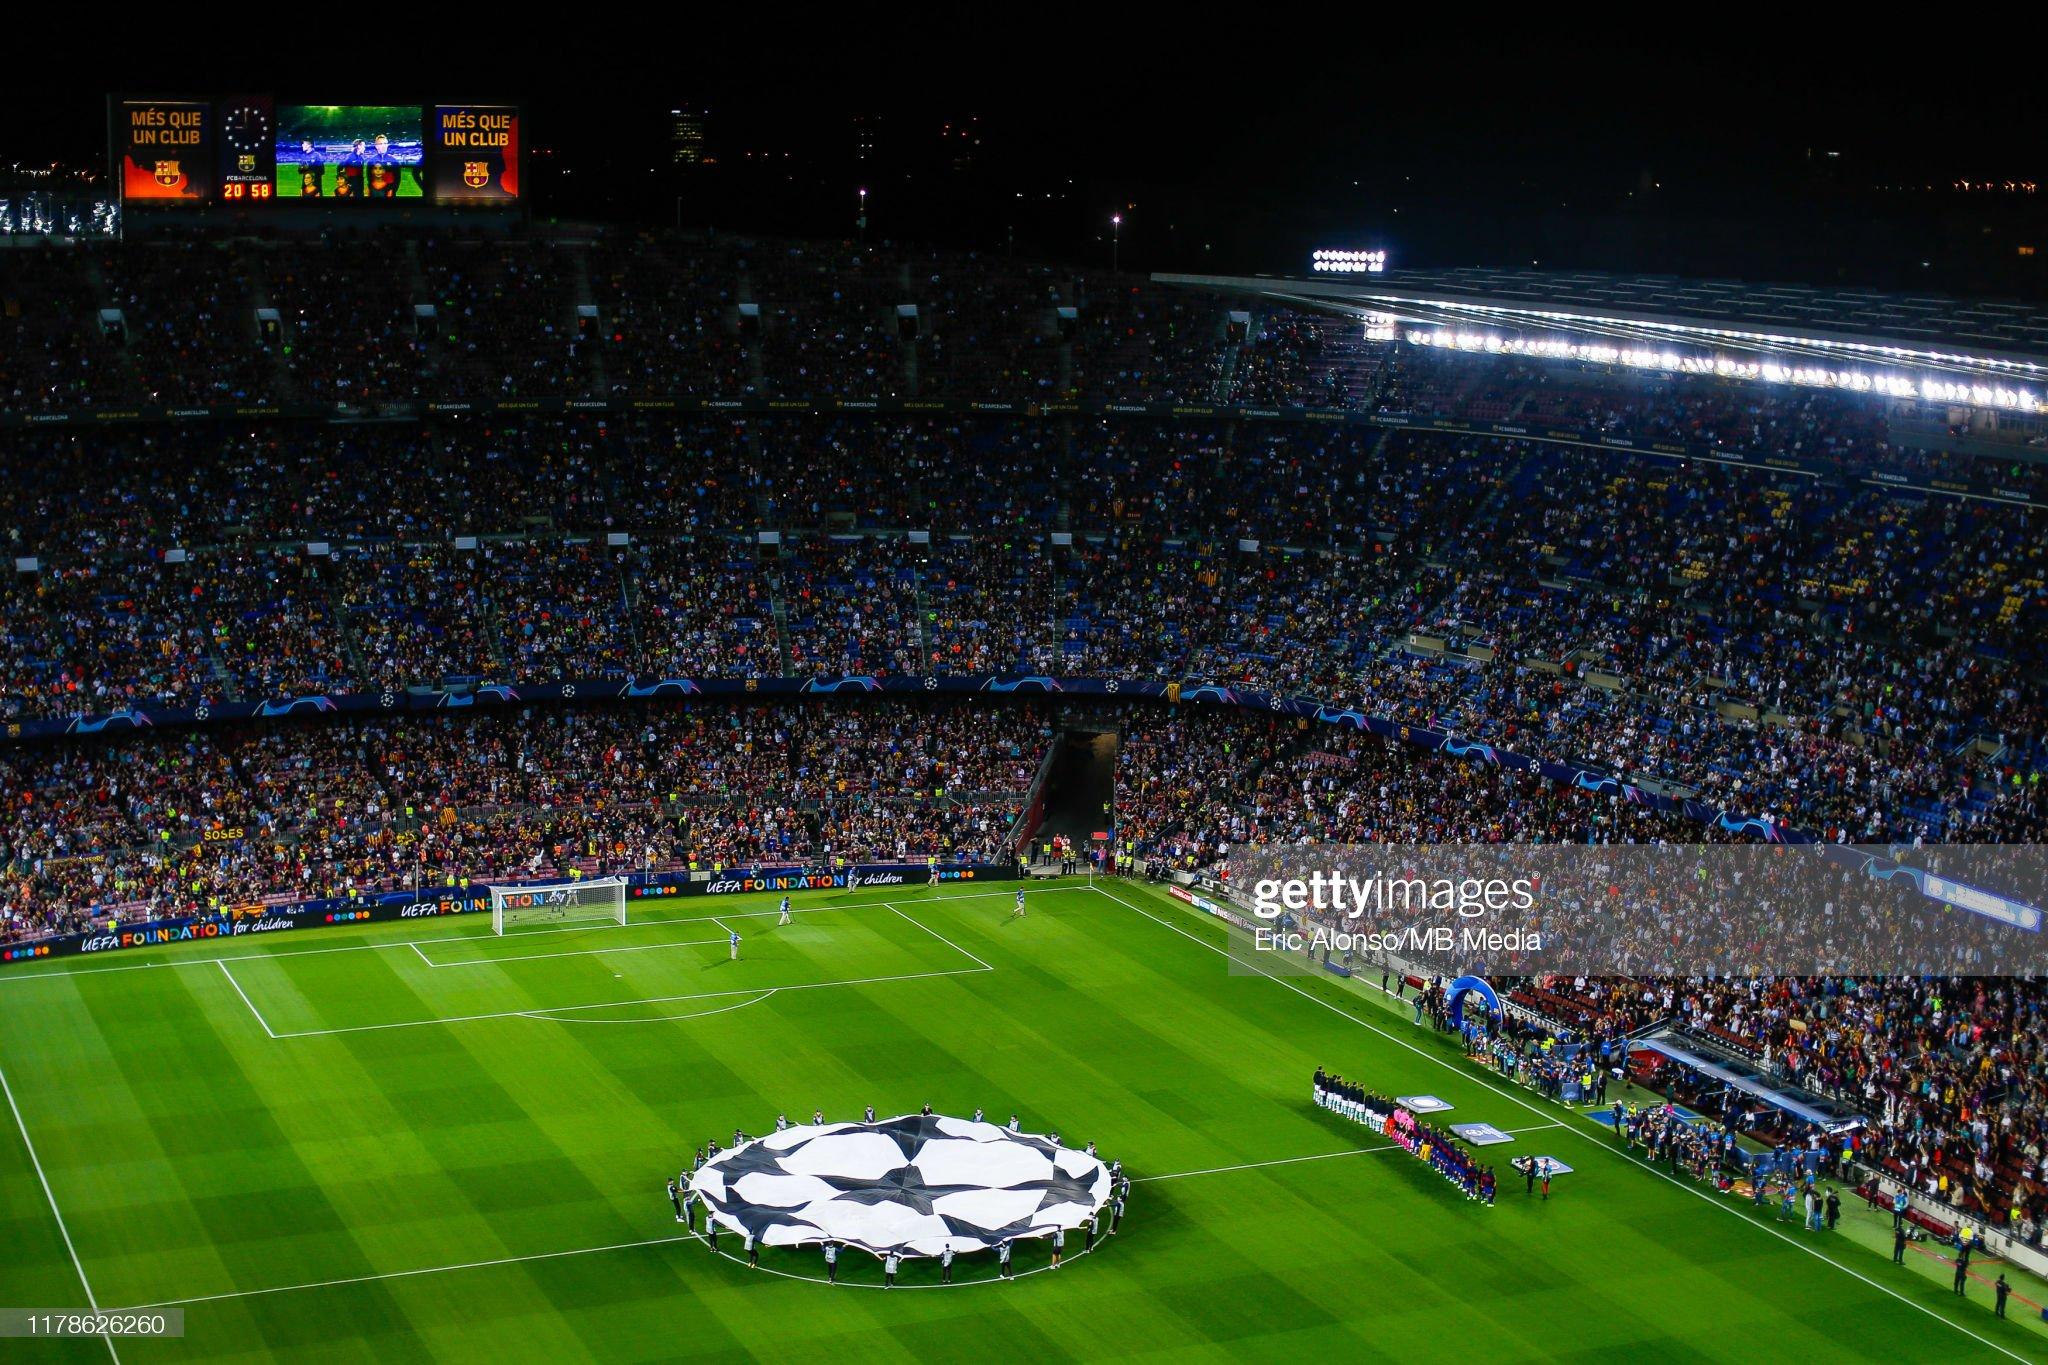 صور مباراة : برشلونة - إنتر 2-1 ( 02-10-2019 )  General-view-of-the-camp-npu-during-the-uefa-champions-league-group-f-picture-id1178626260?s=2048x2048